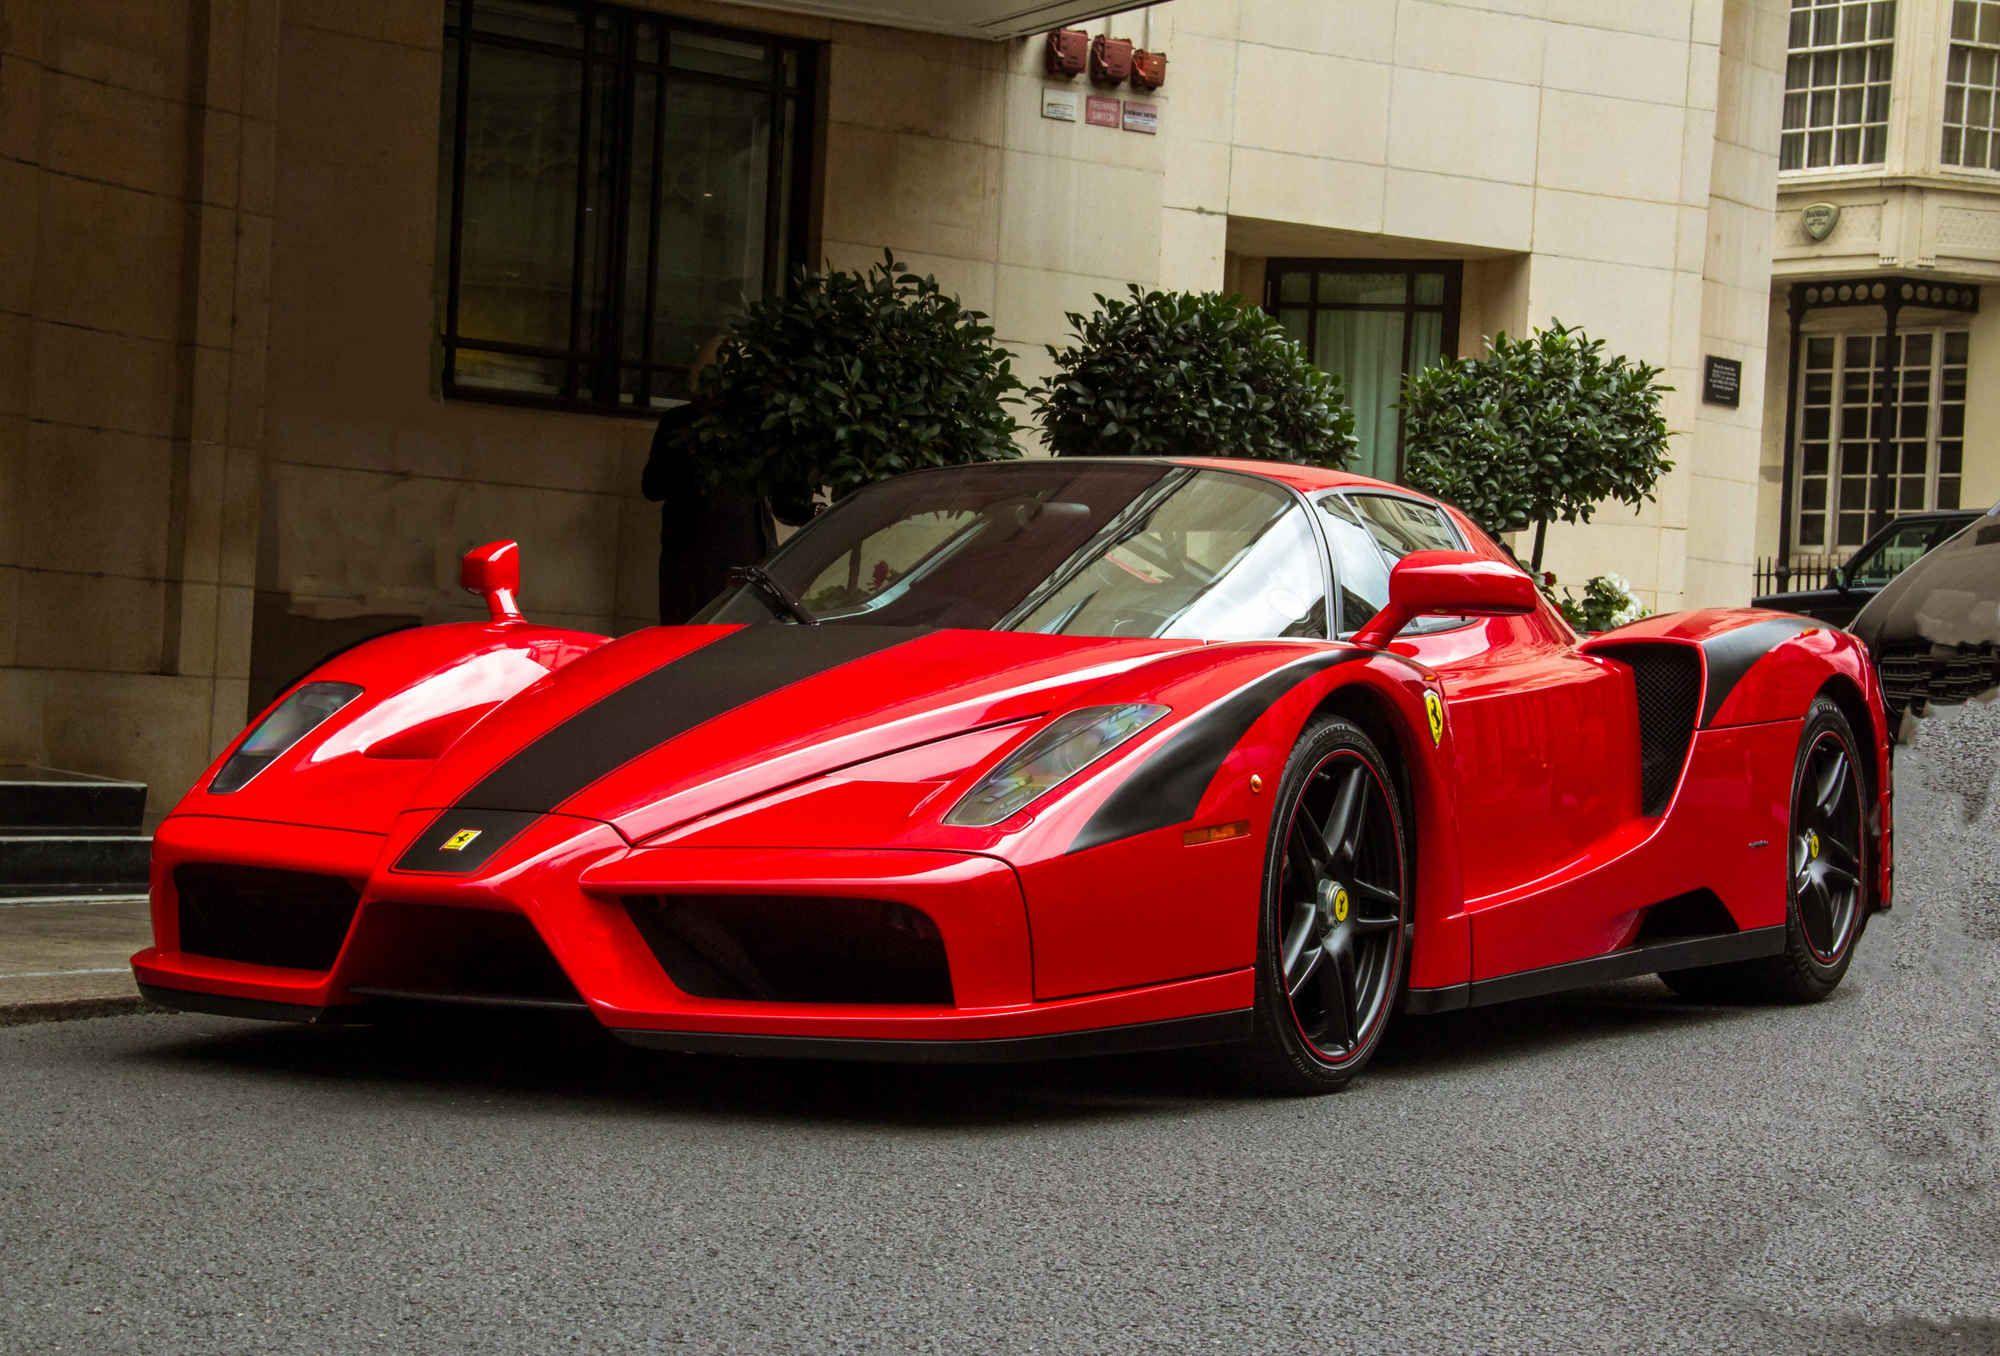 Best Enzo Ferrari Quotes About Cars and Racing - Supercompressor.com ...